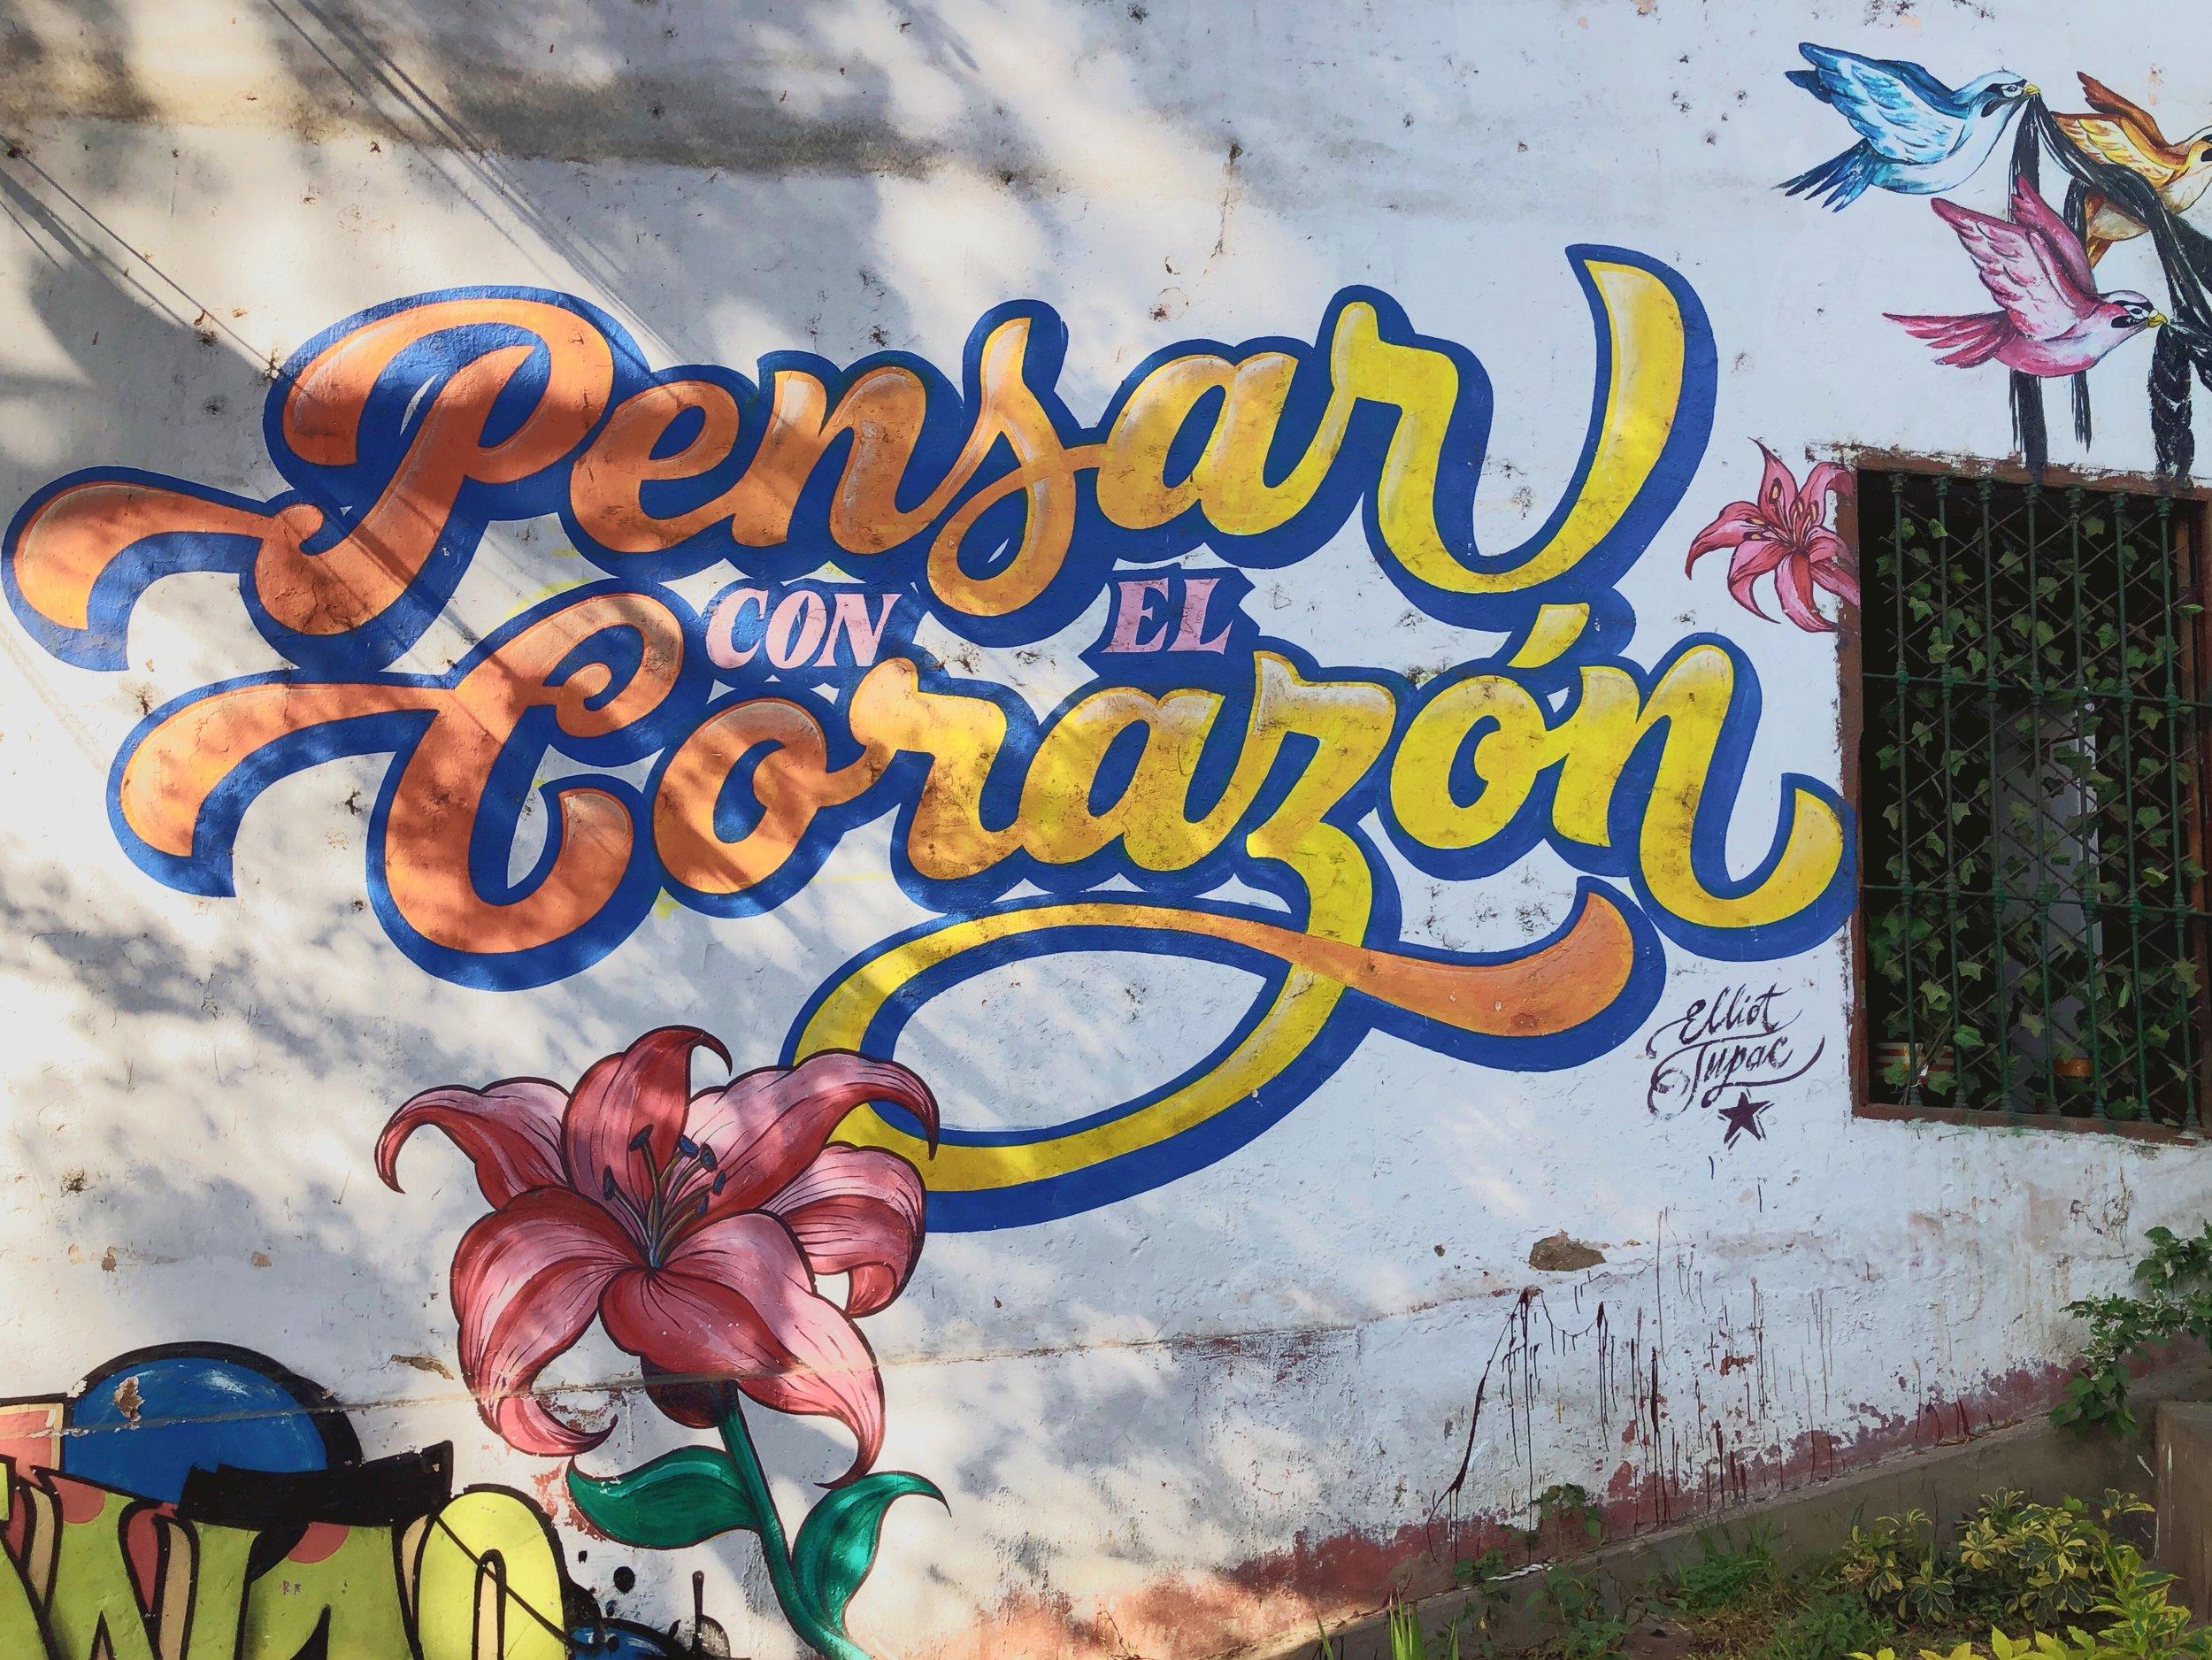 barranco-south america-lima-peru-bridge of sighs-travel tips-graffiti-2